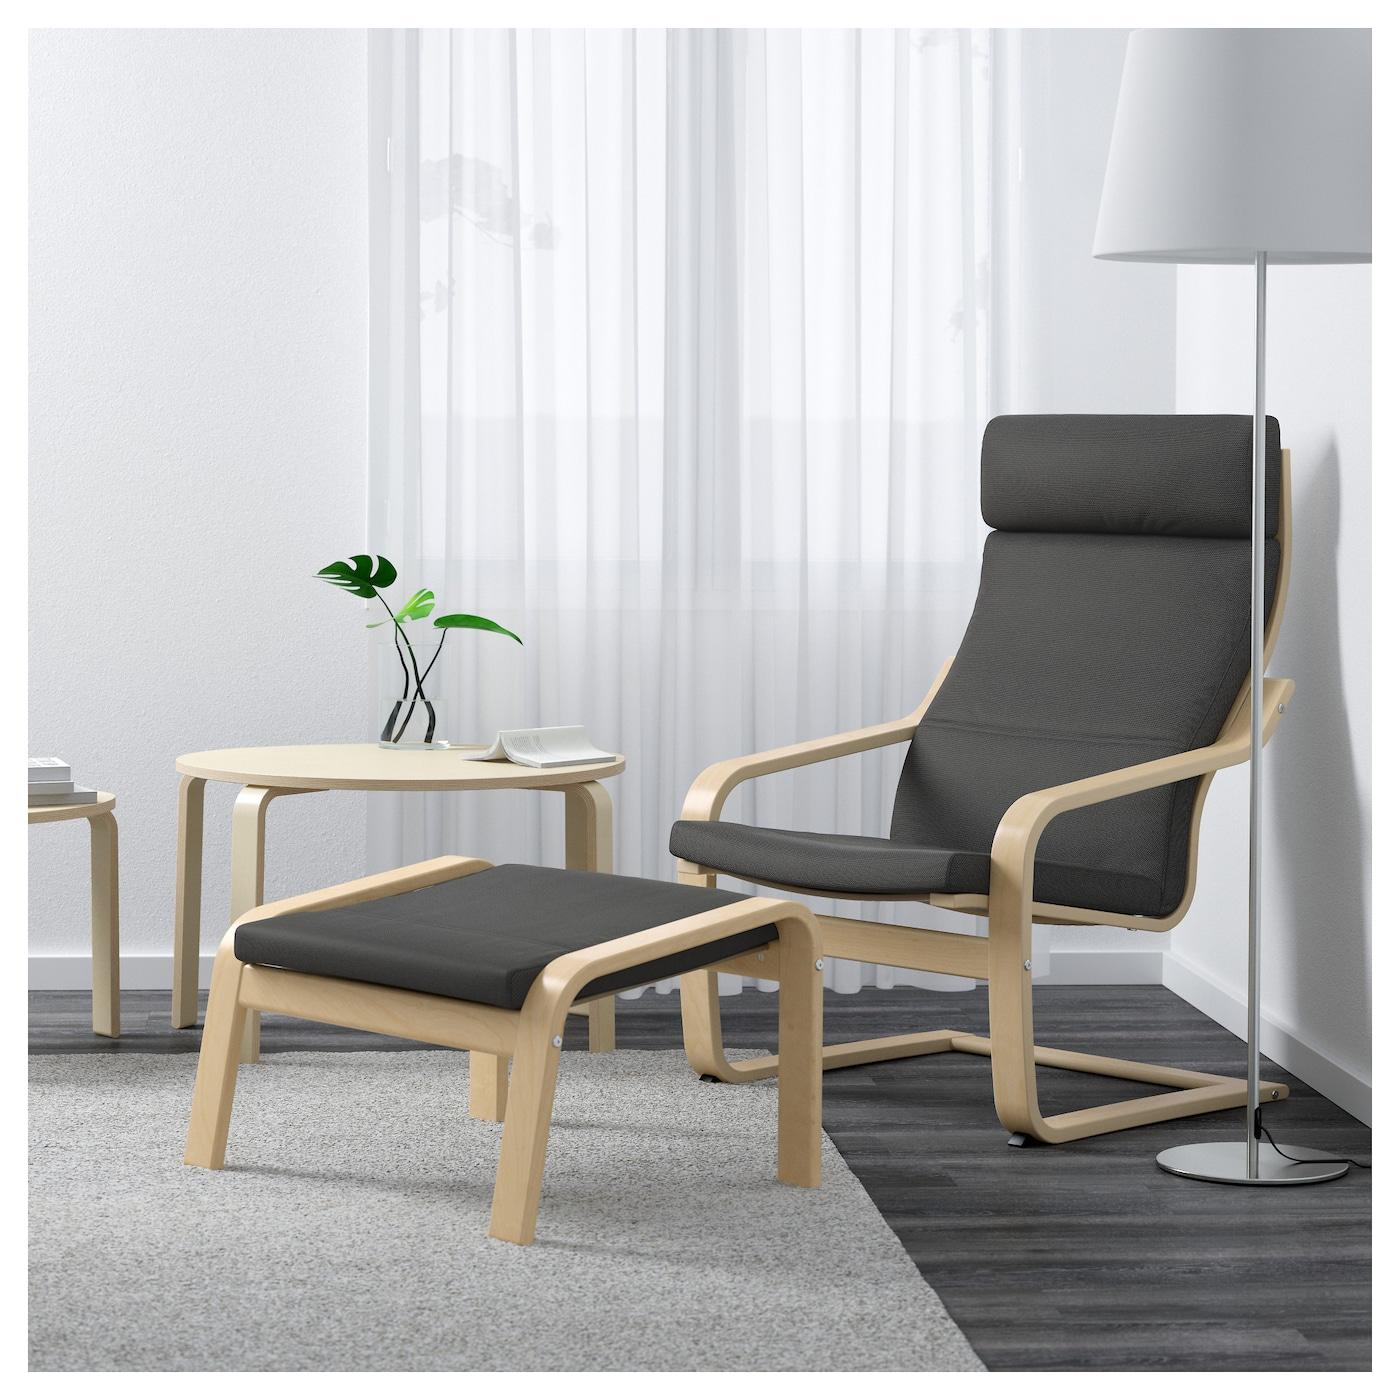 Uncategorized Poang Footstool footstool birch veneerfinnsta grey ikea layer glued bent beech frame gives comfortable resilience